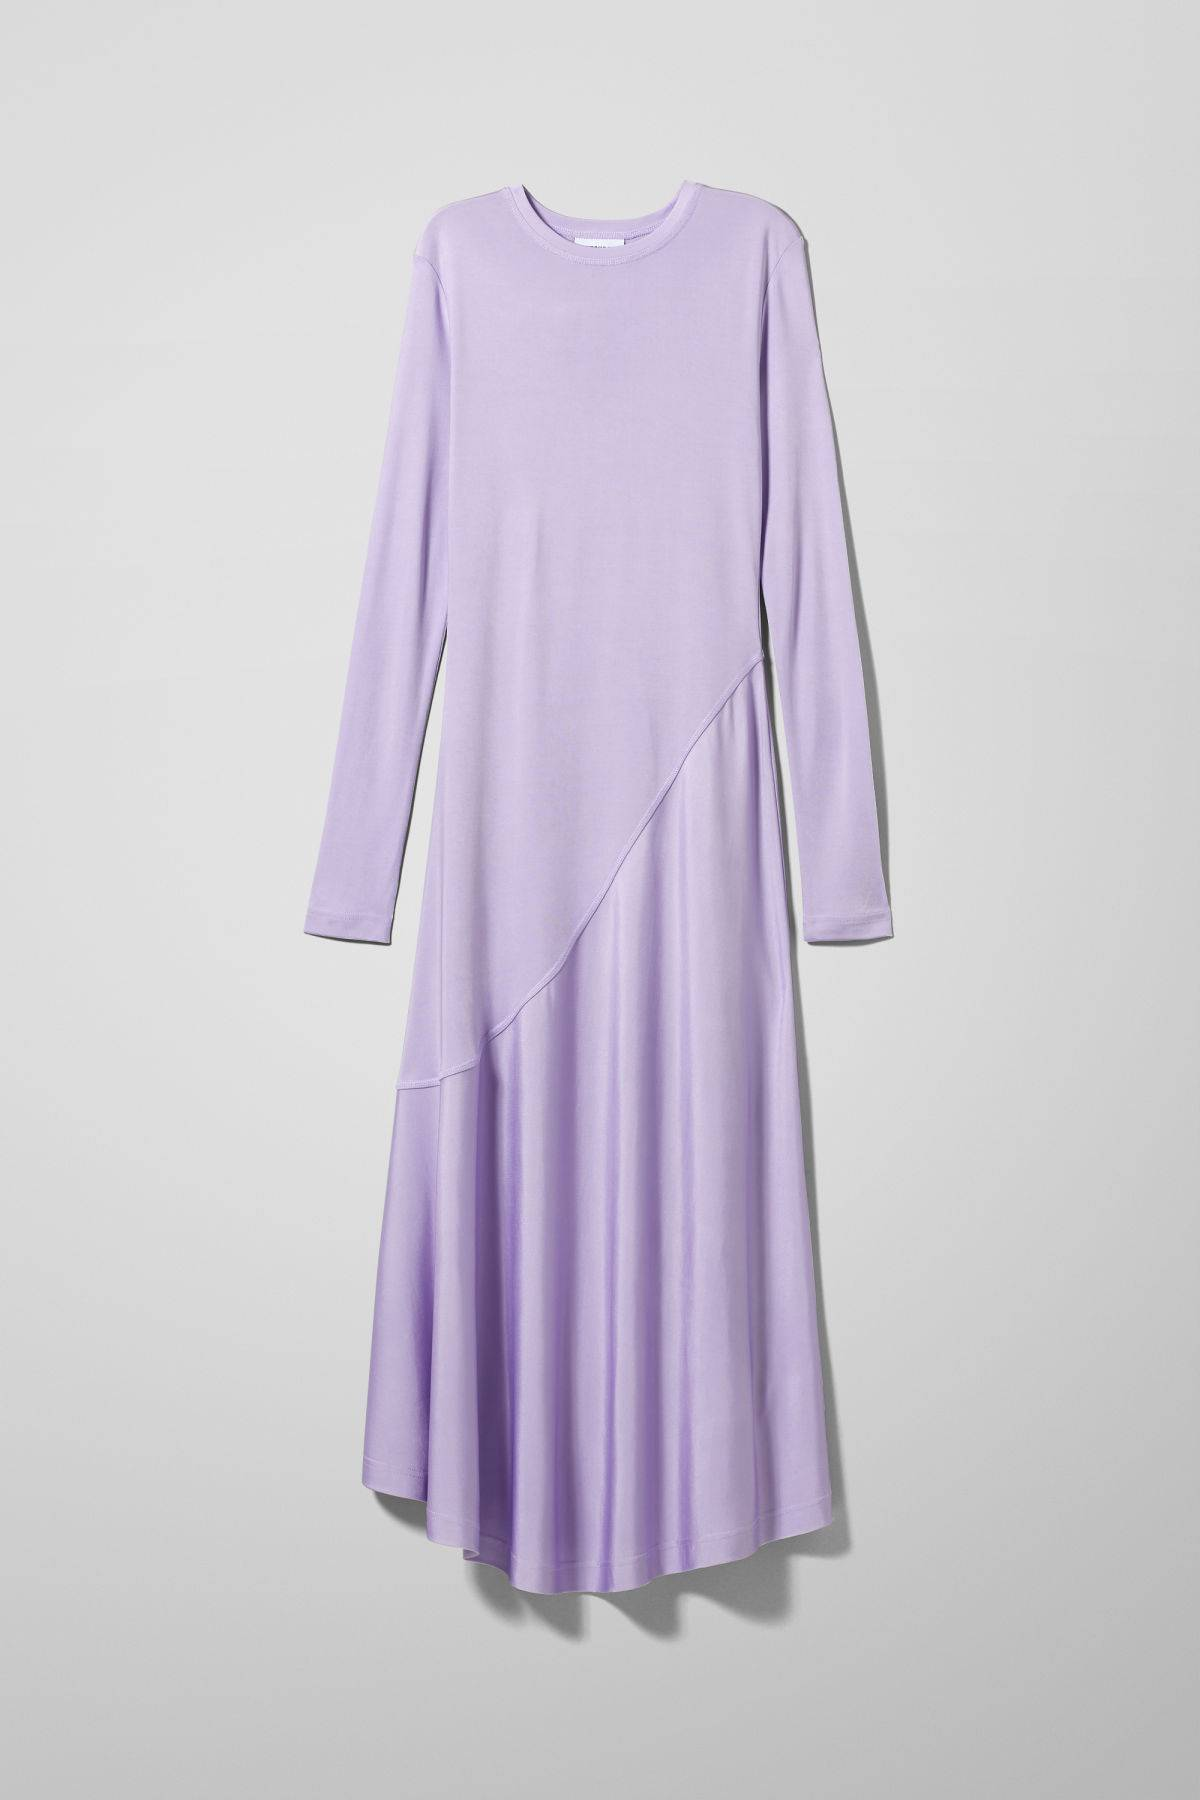 Image of Karen Dress - Purple-M